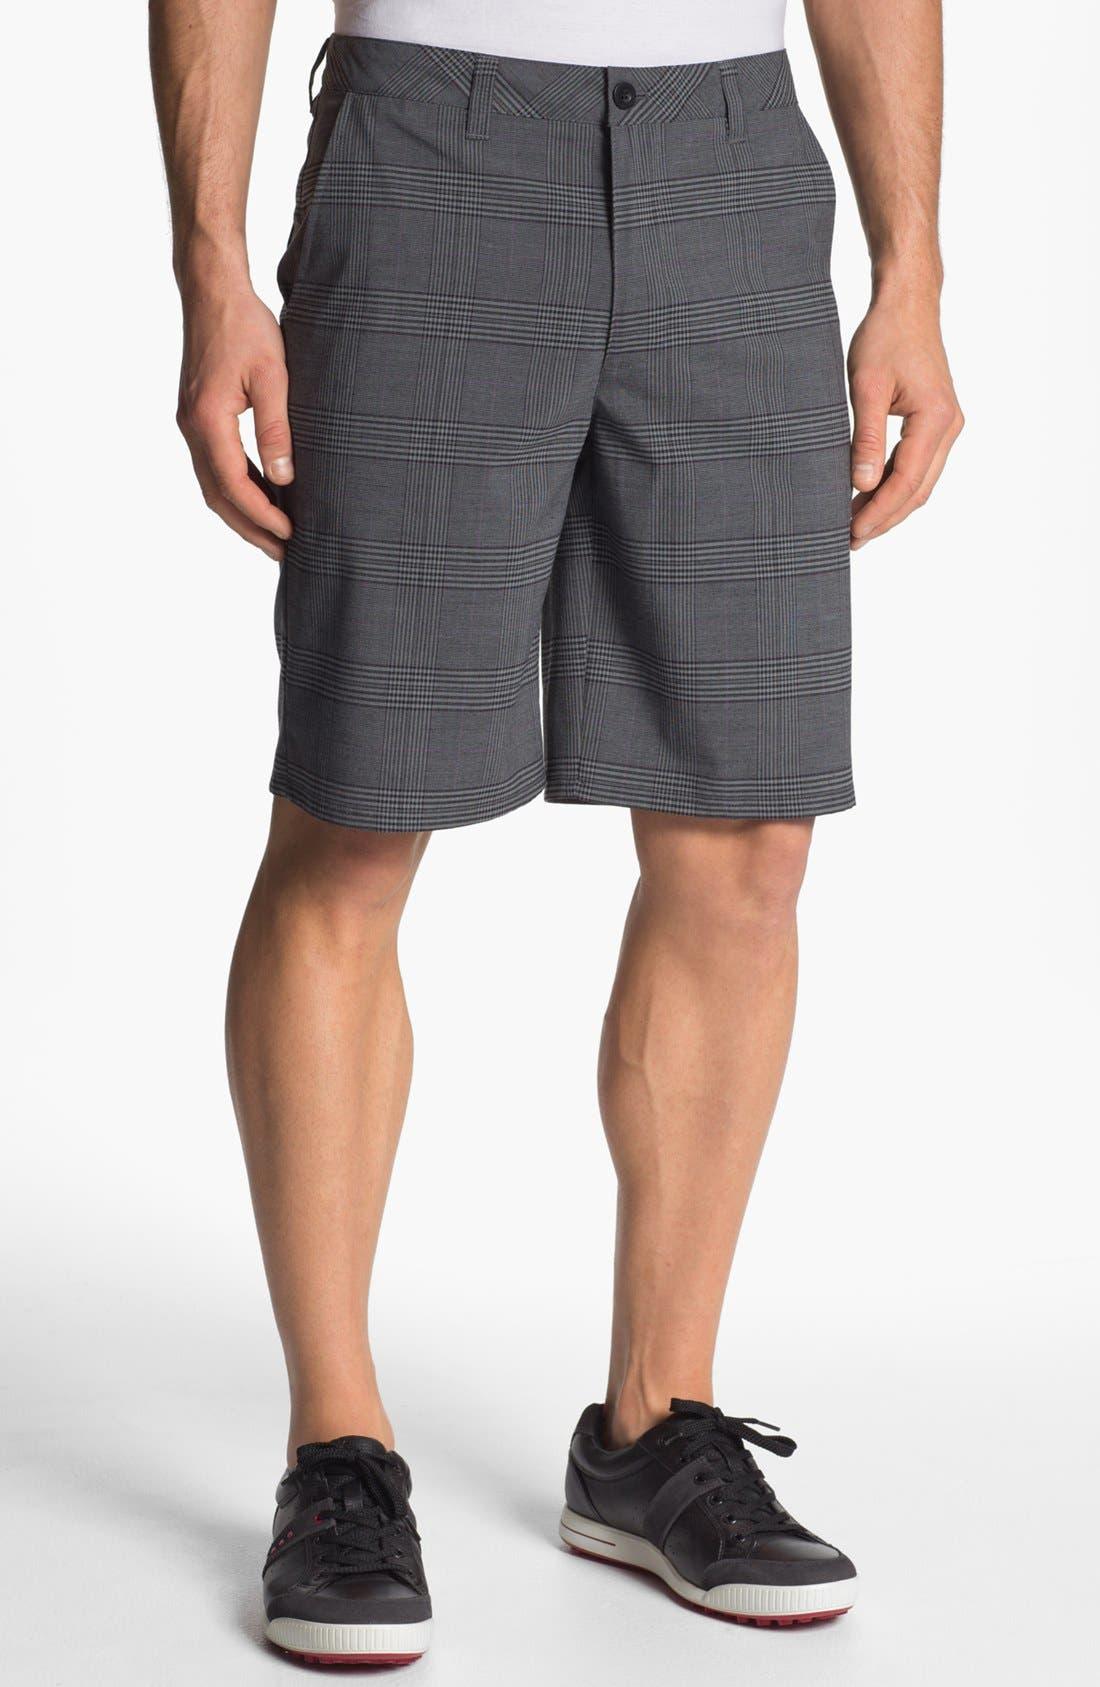 Alternate Image 1 Selected - Travis Mathew 'Consignment' Golf Shorts